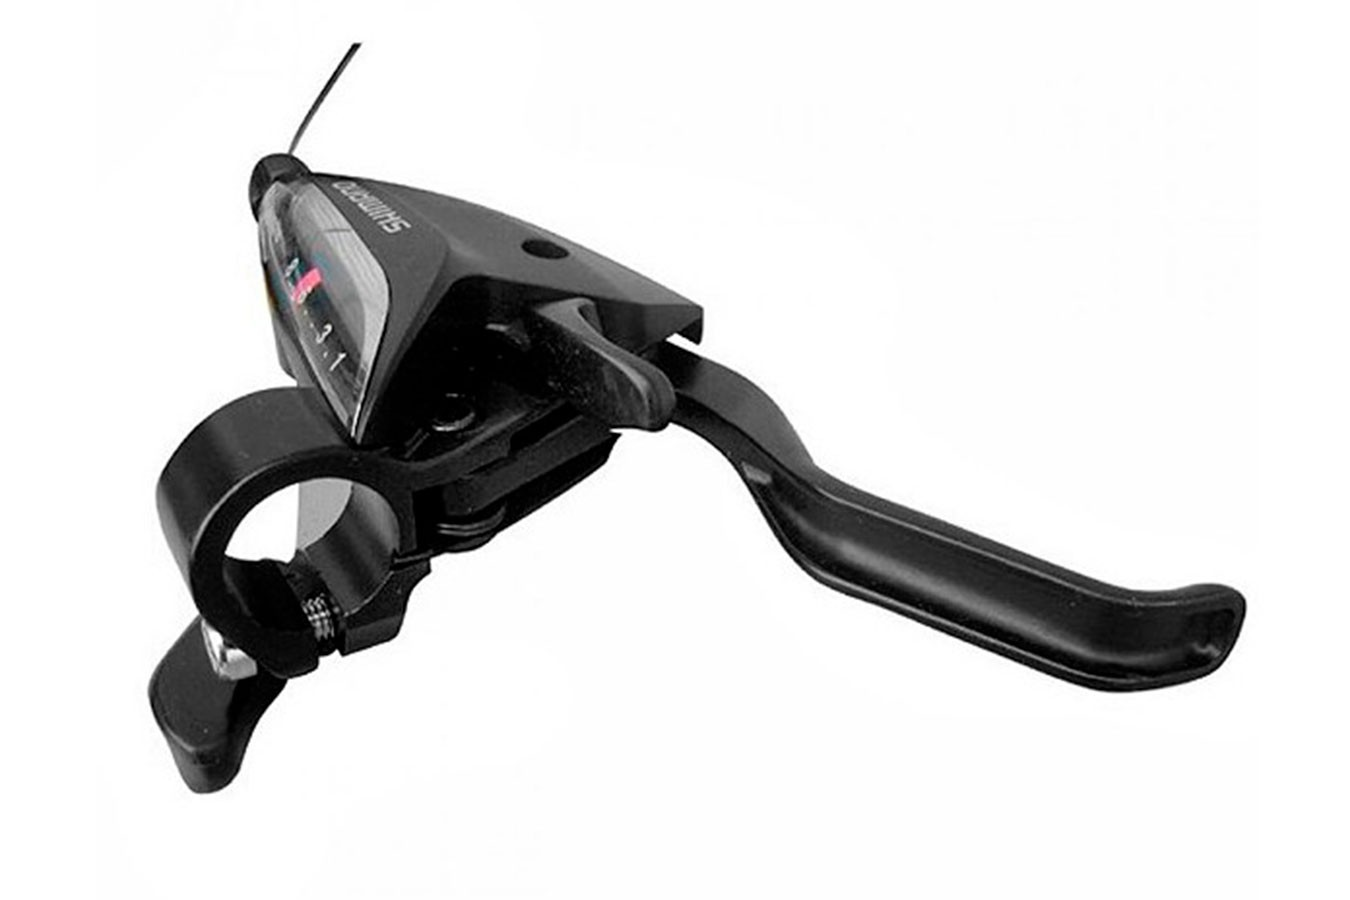 Alavanca de câmbio Shimano Altus/Acera 24V ST-EF65